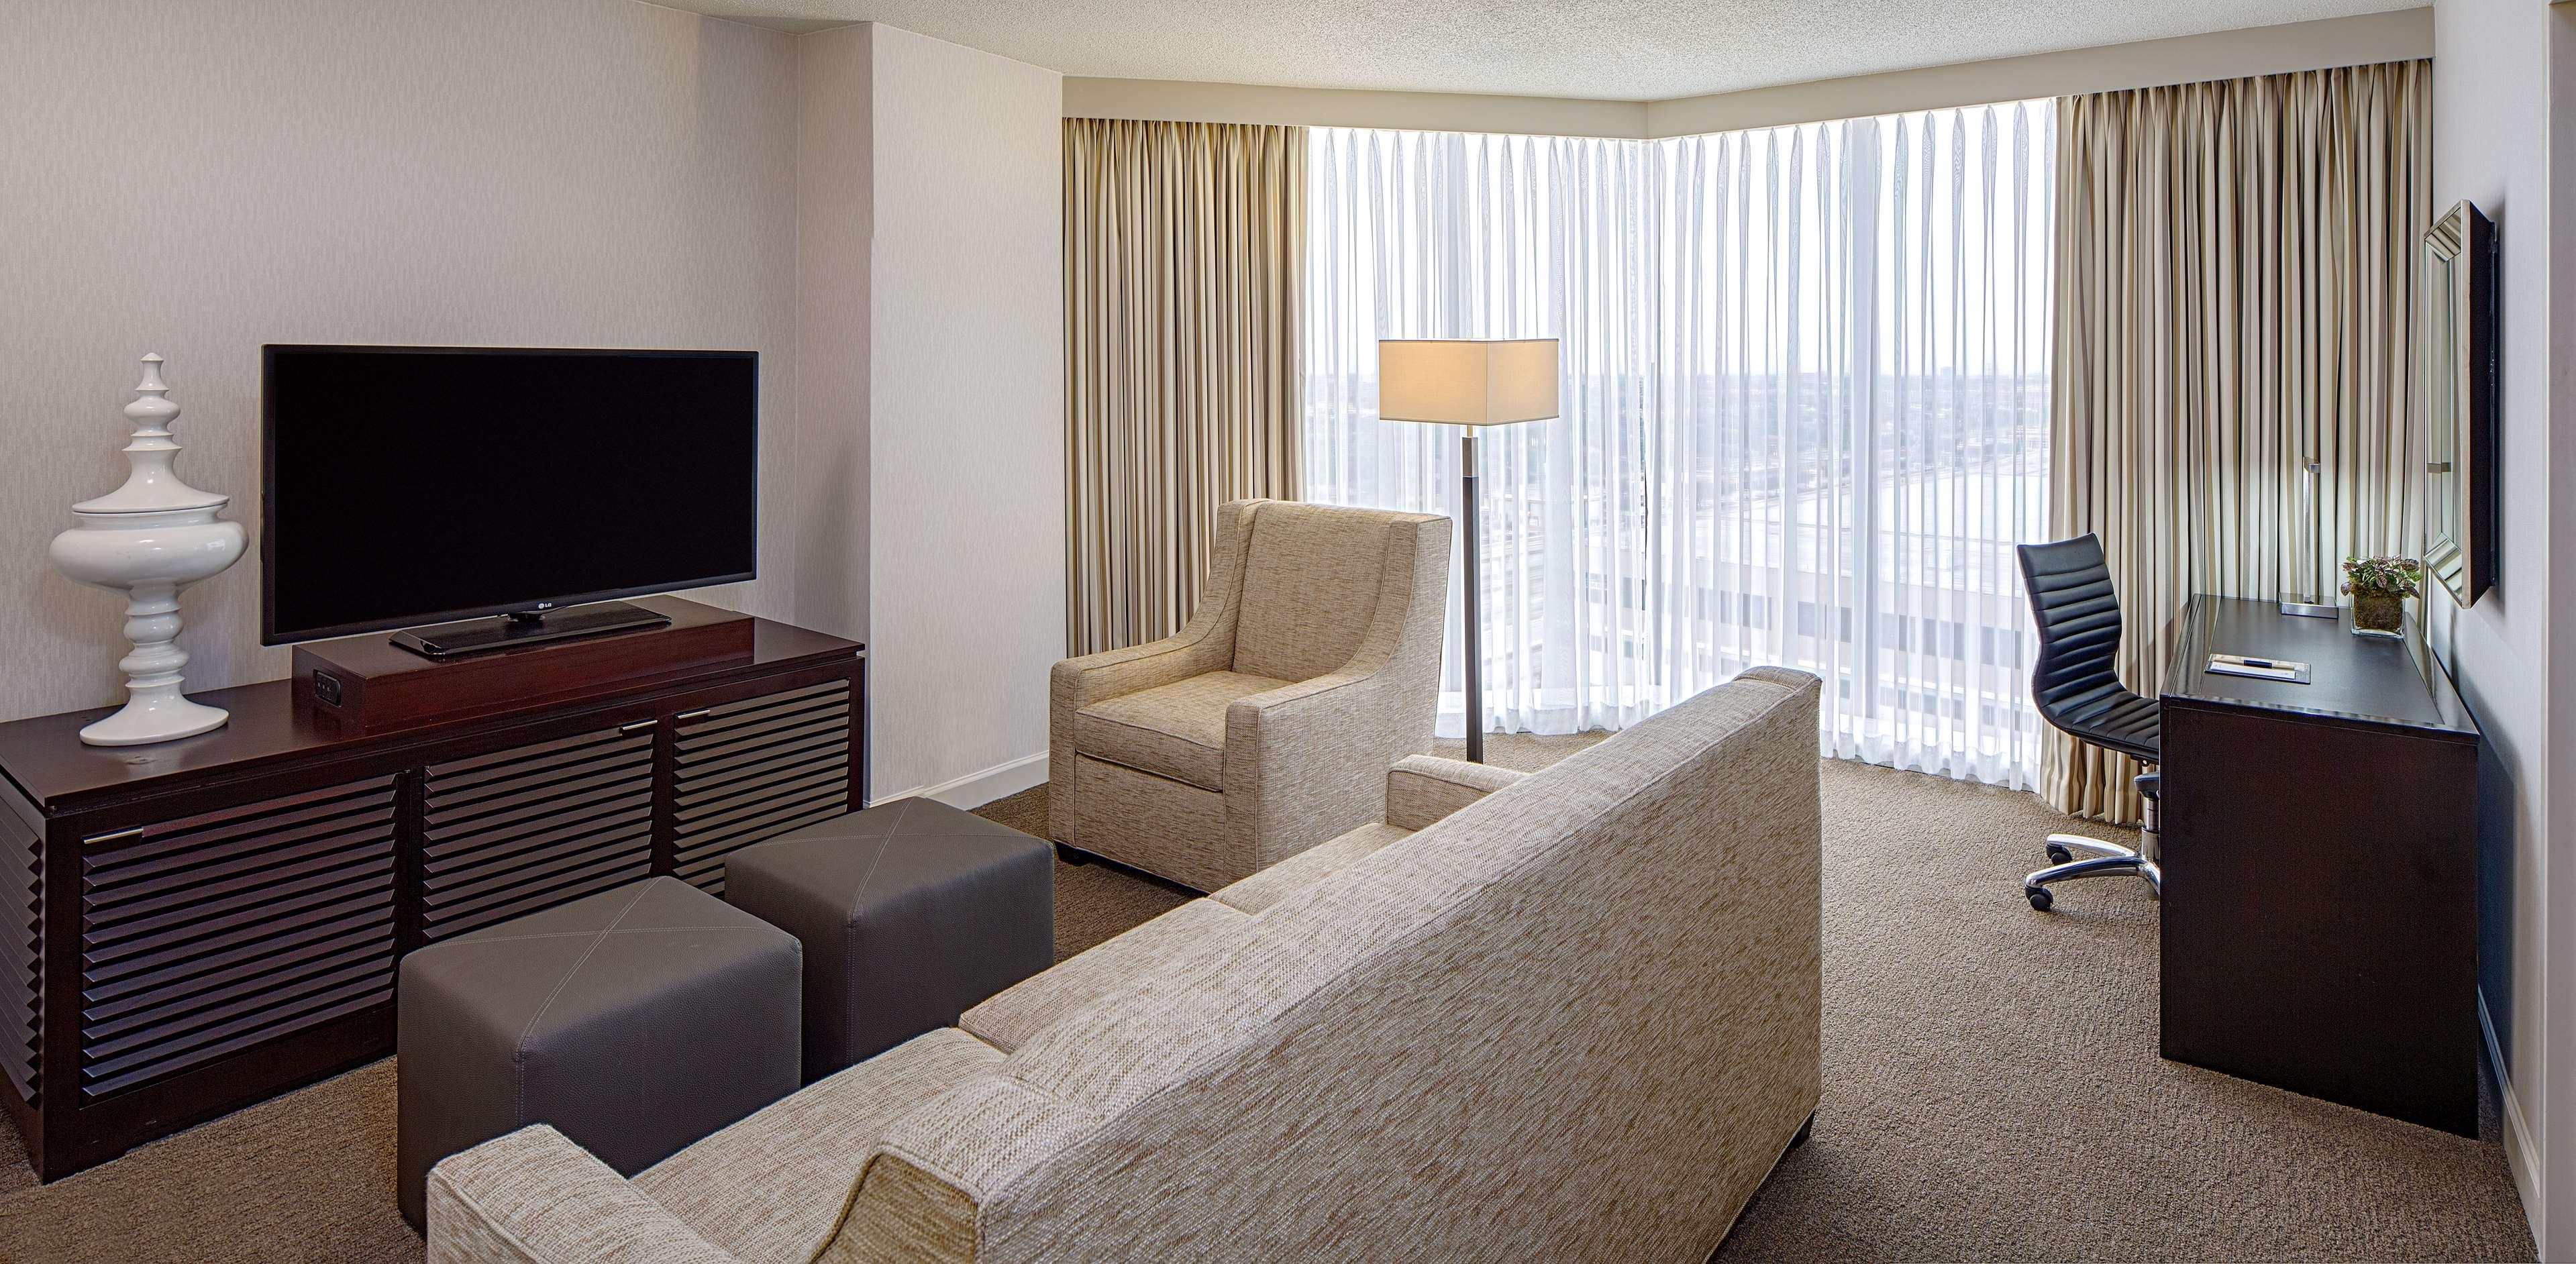 DoubleTree by Hilton Hotel Houston - Greenway Plaza image 13